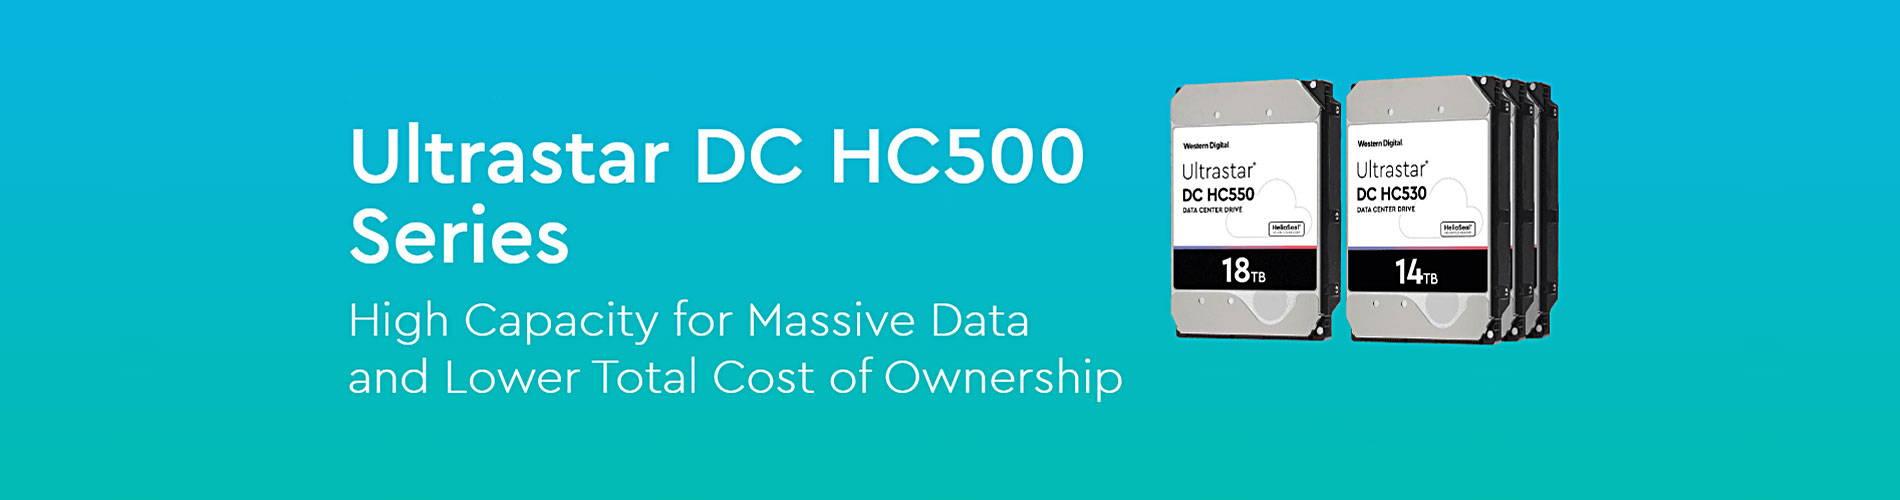 Ultrastar DC HC500 Series